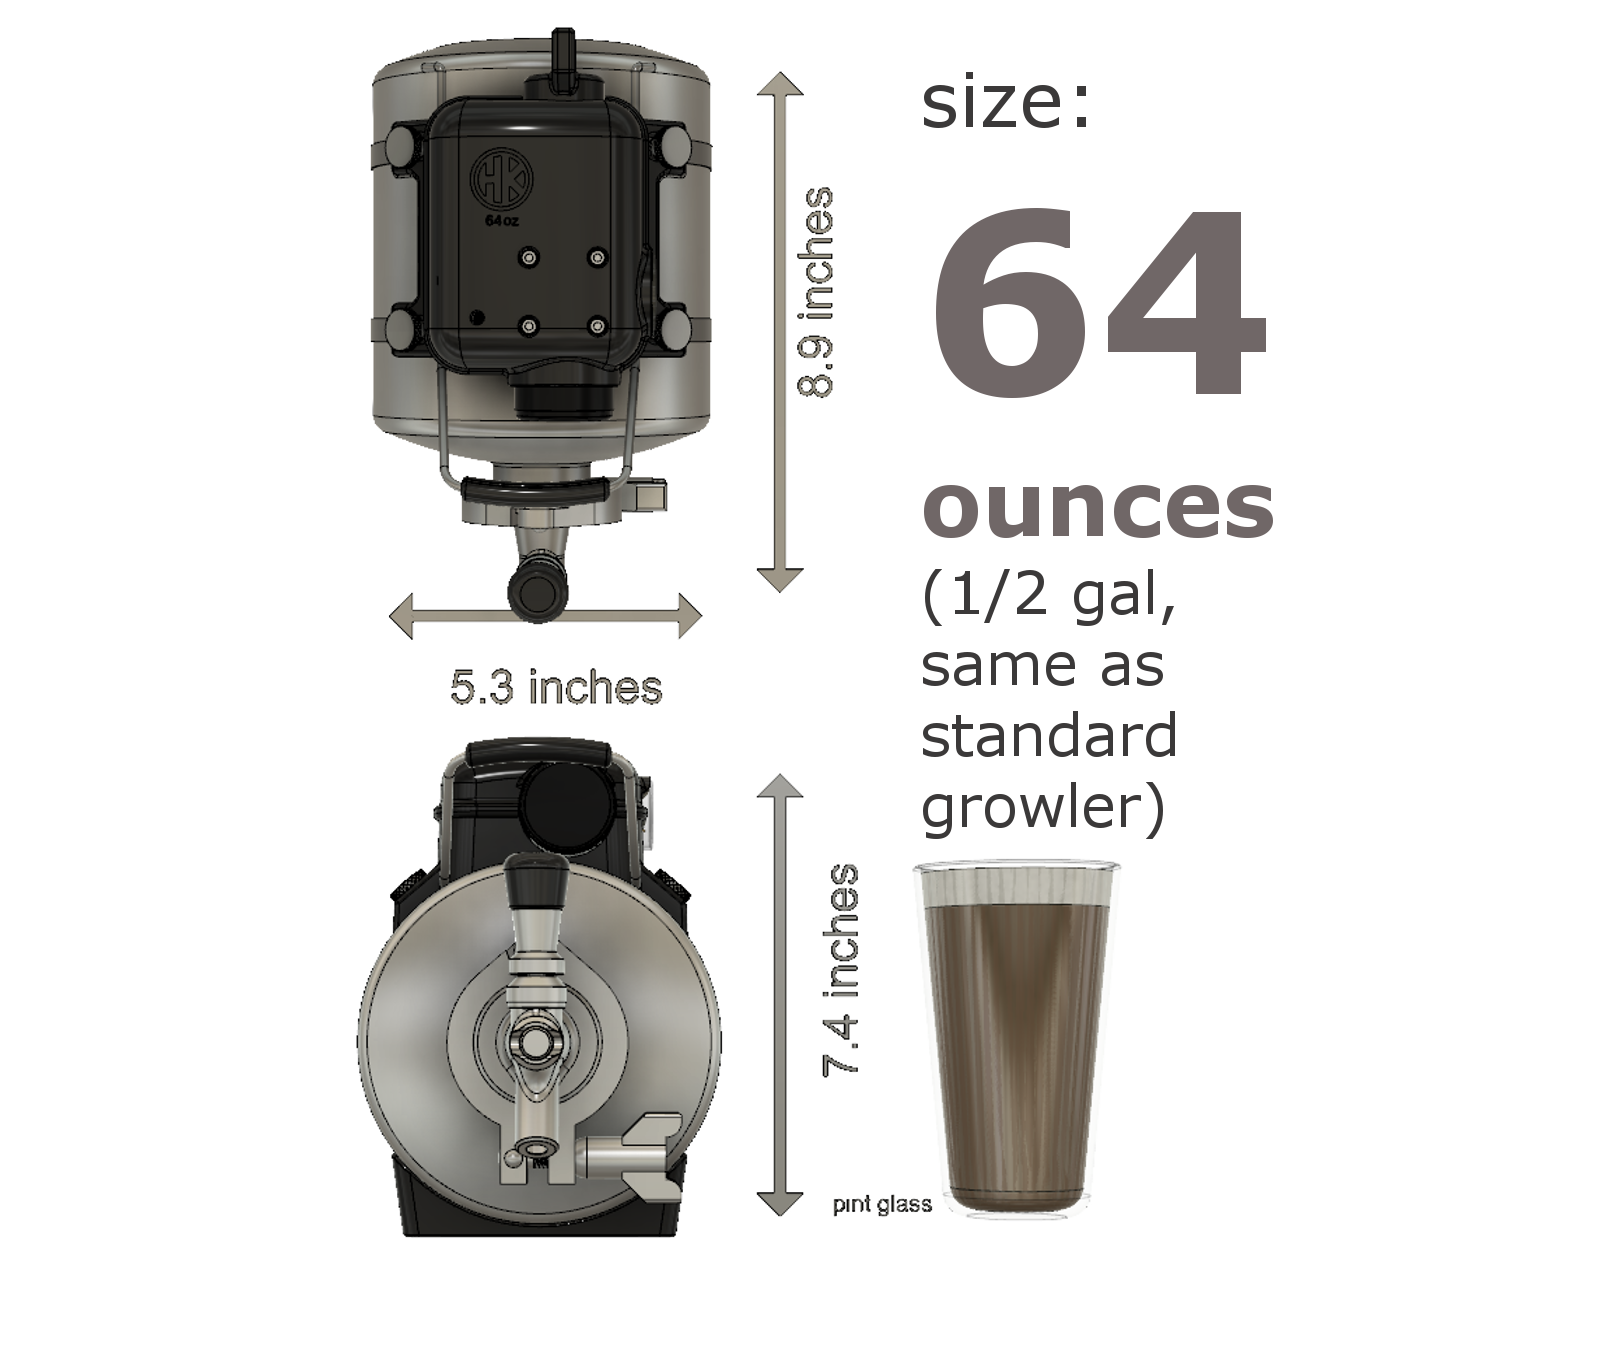 Dimensions of 64 oz Hendrix growler keg